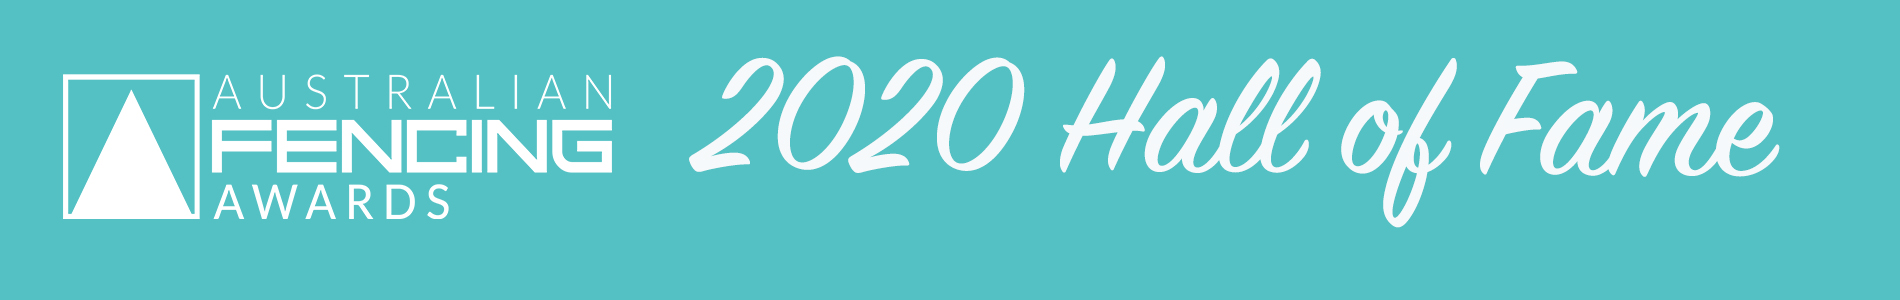 2020 hall of fame banner